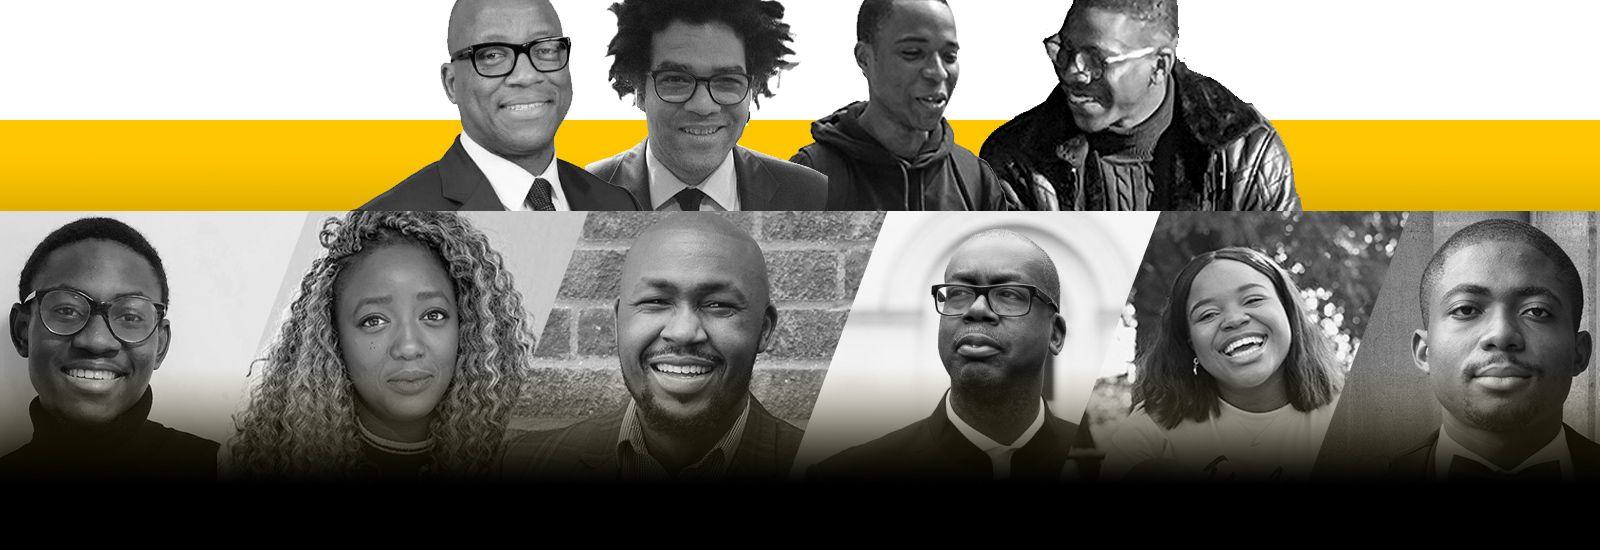 Oxford celebrates Black History Month